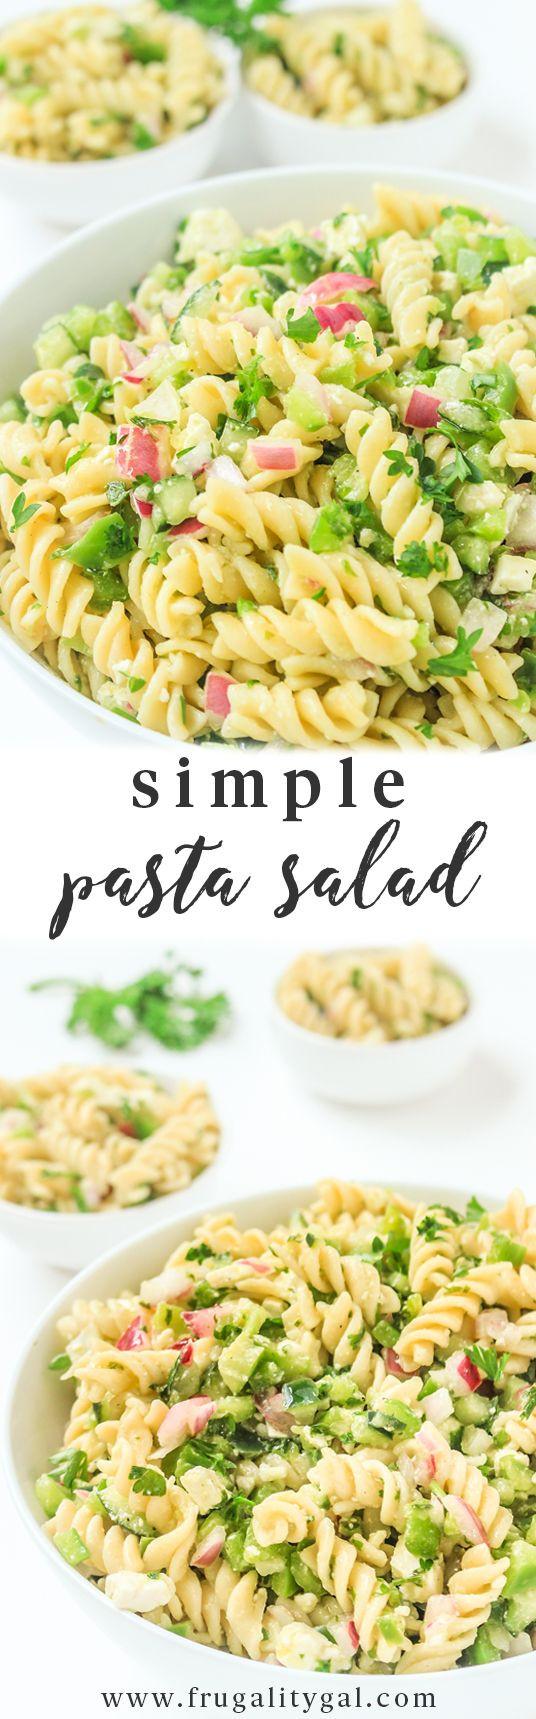 Cold Vegetarian Potluck Recipes  Easy Pasta Salad Recipe Cold Pasta Salad Recipes Cold